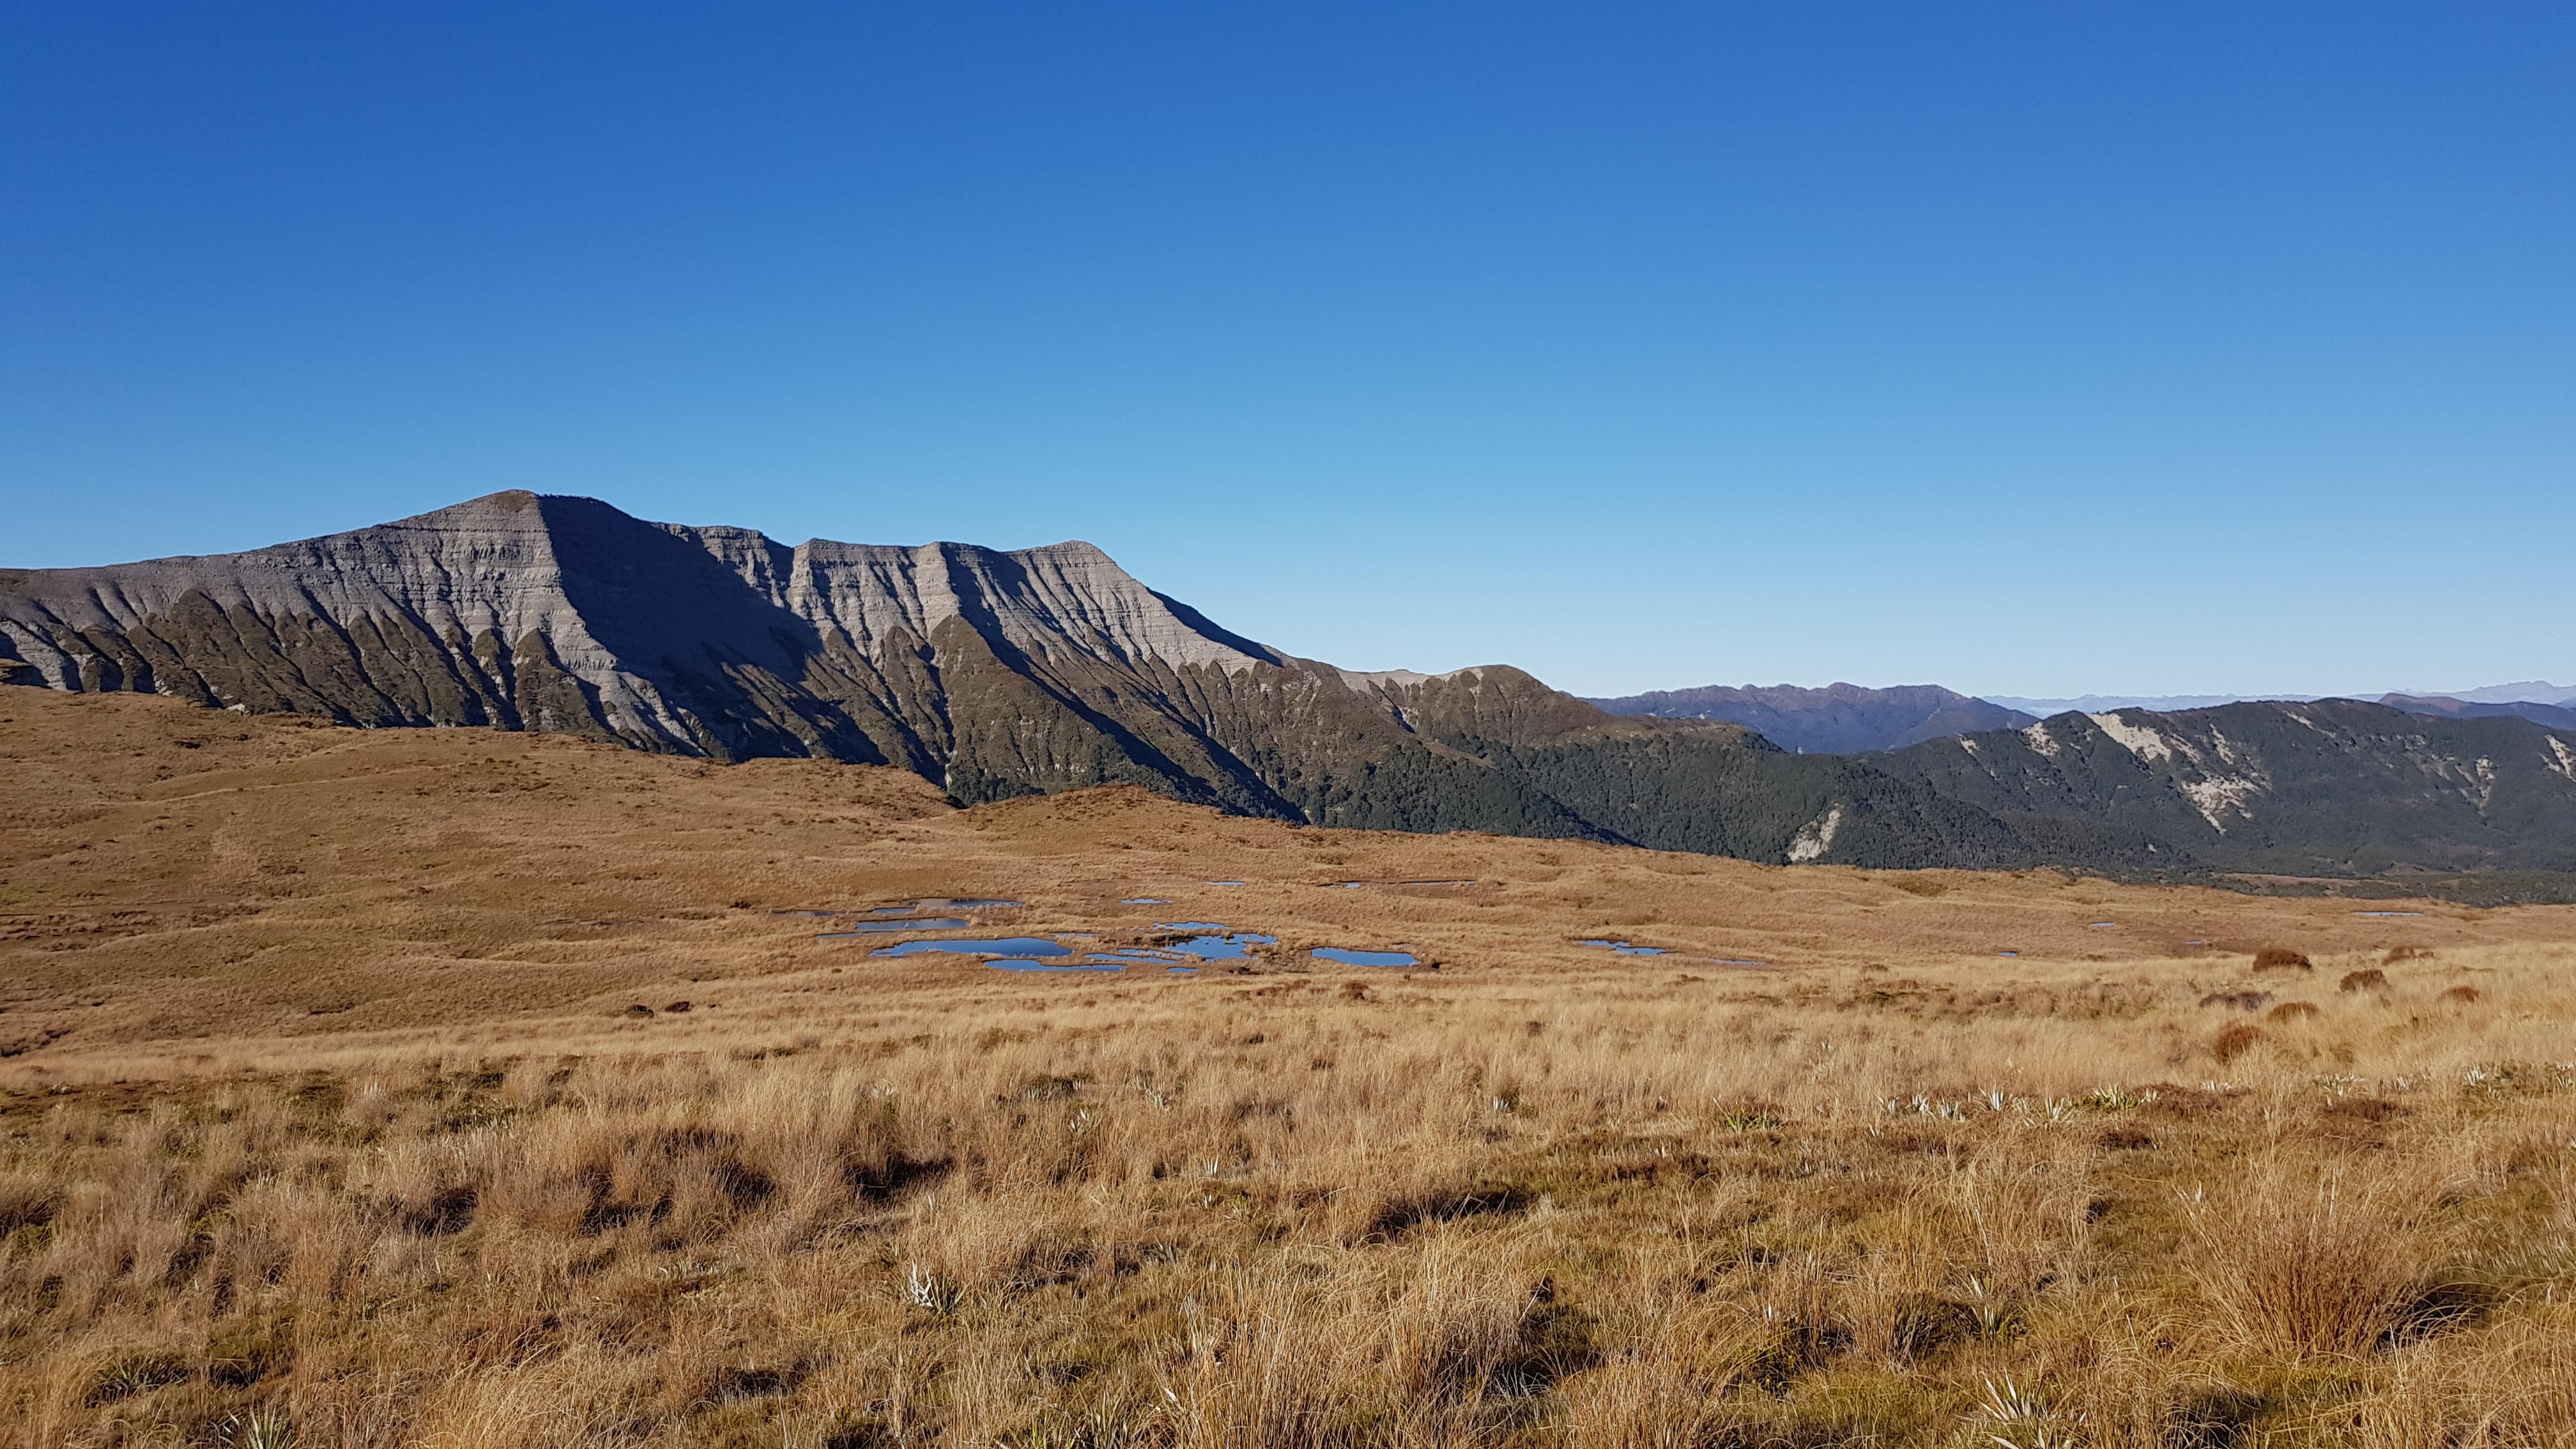 Crossing 100 Acre Plateau